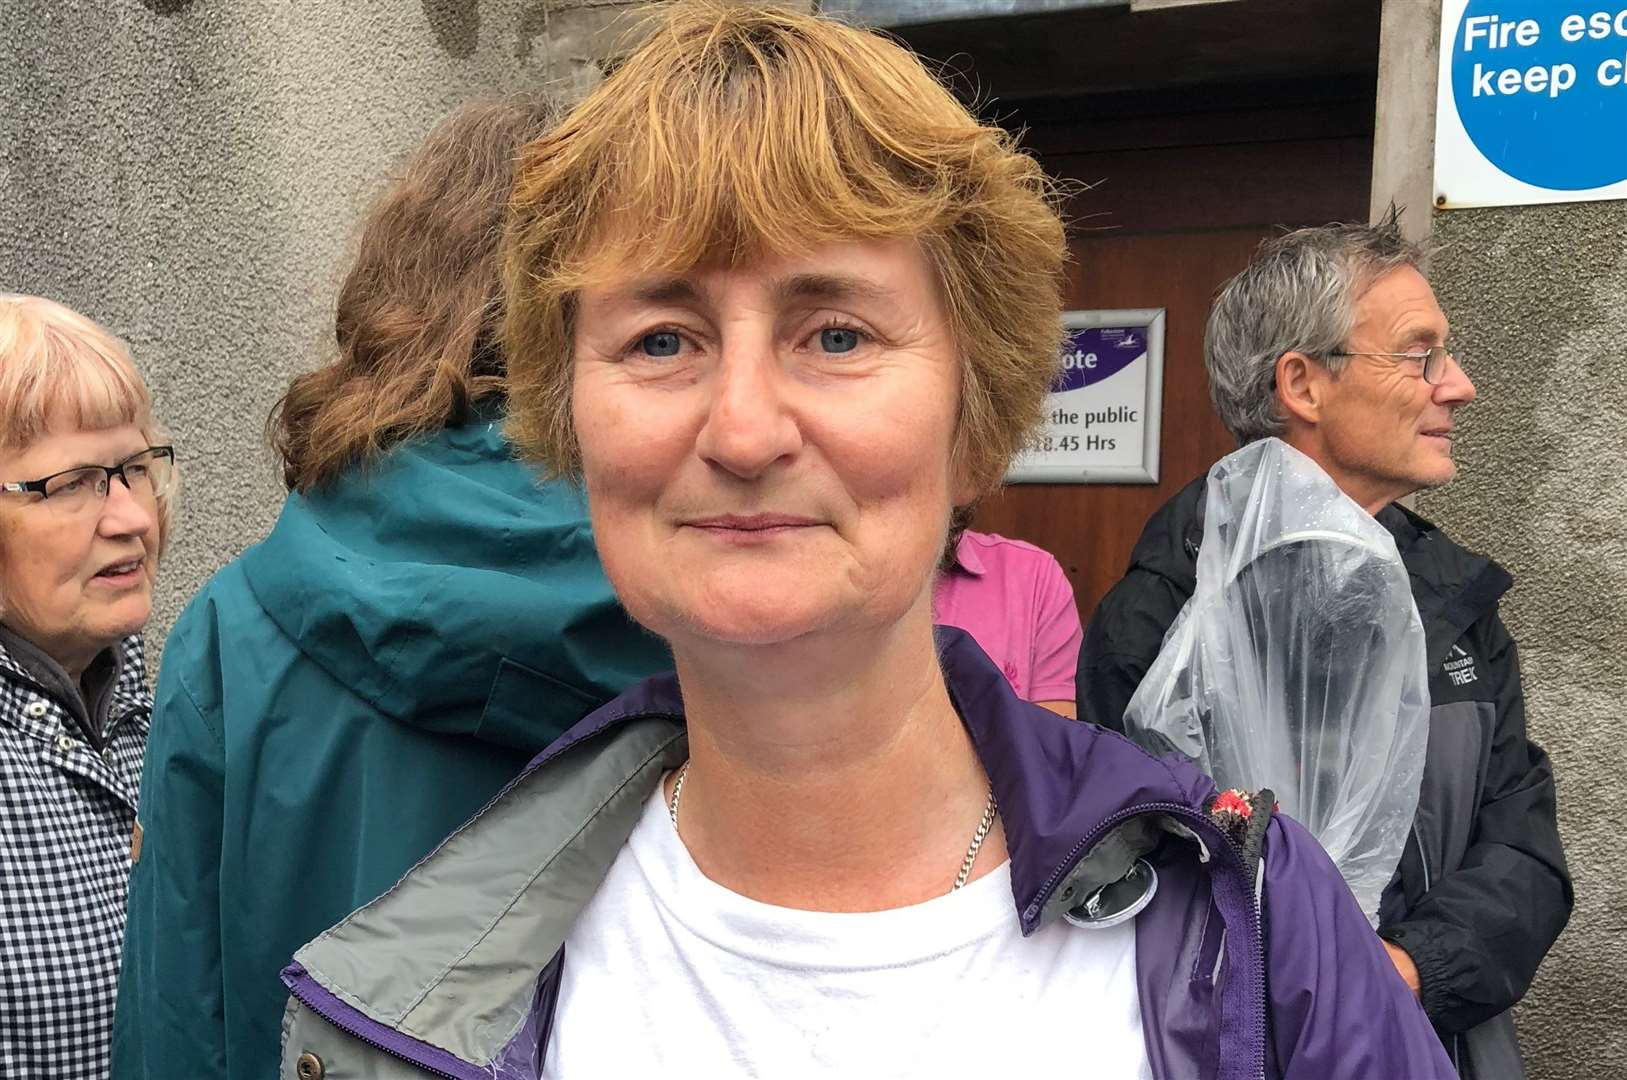 Cllr Lesley Whybrow of Folkestone & Hythe District Council